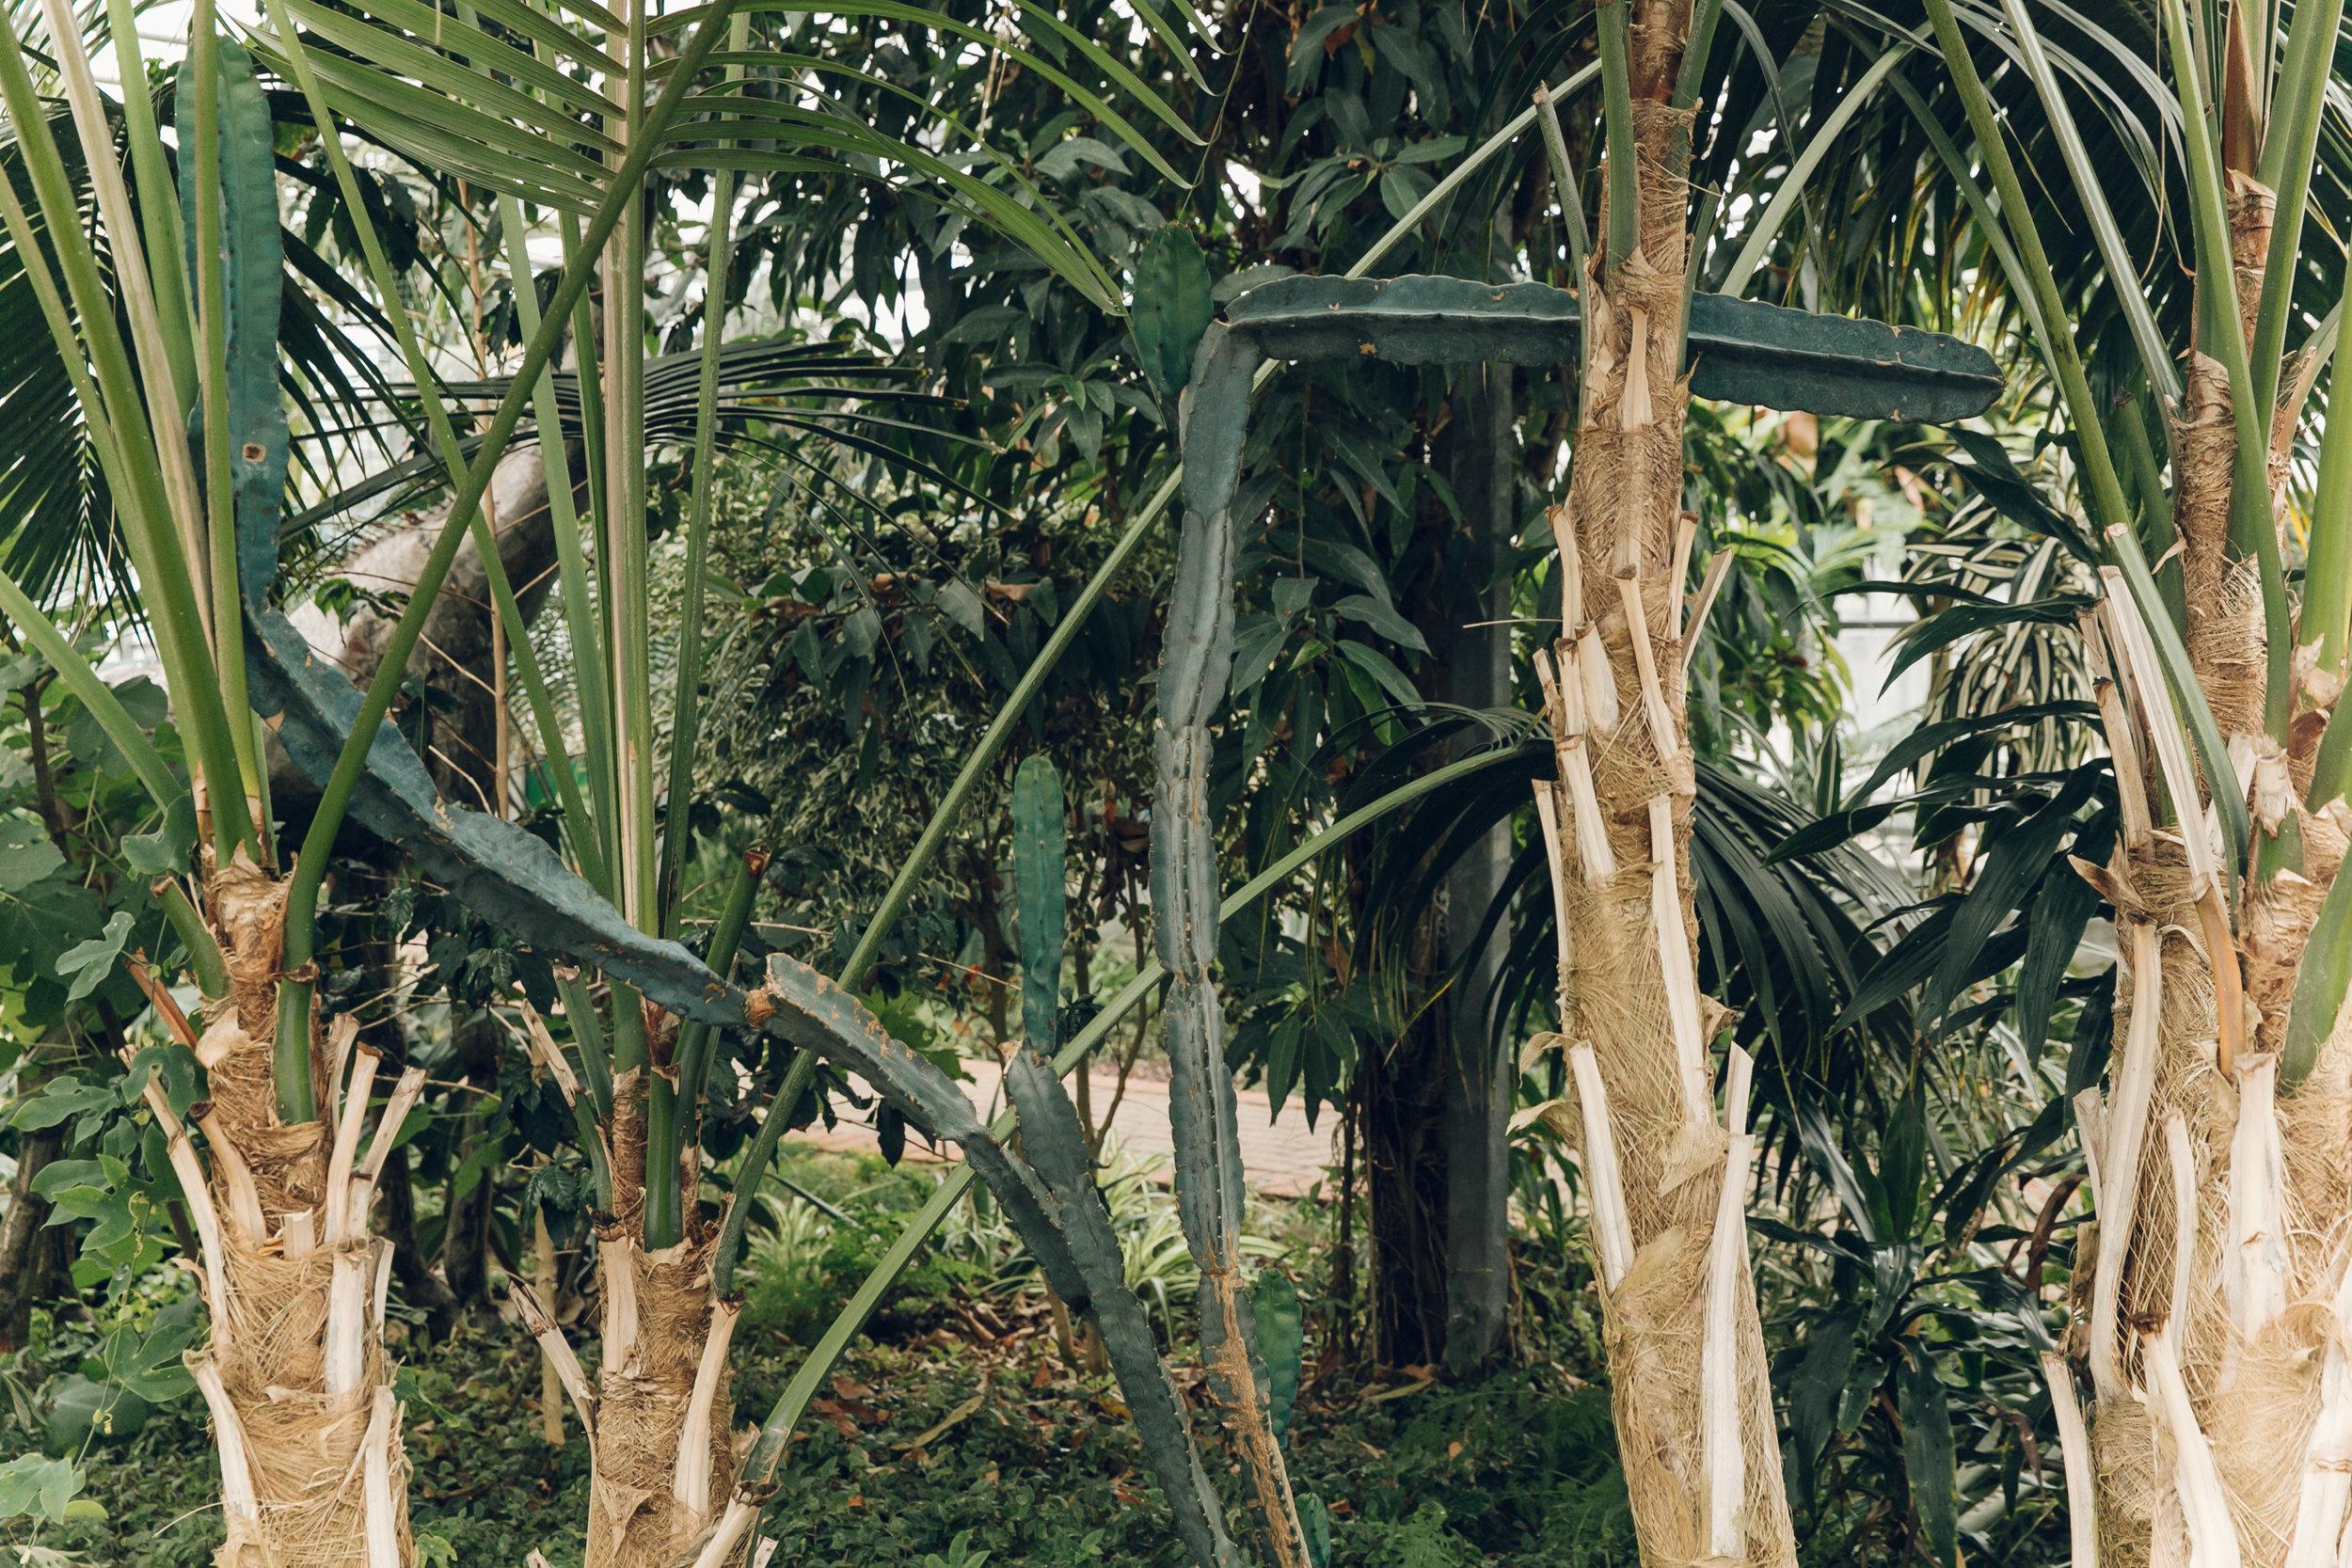 Woodthorpe Grange Tropical House, photographed by Haarkon